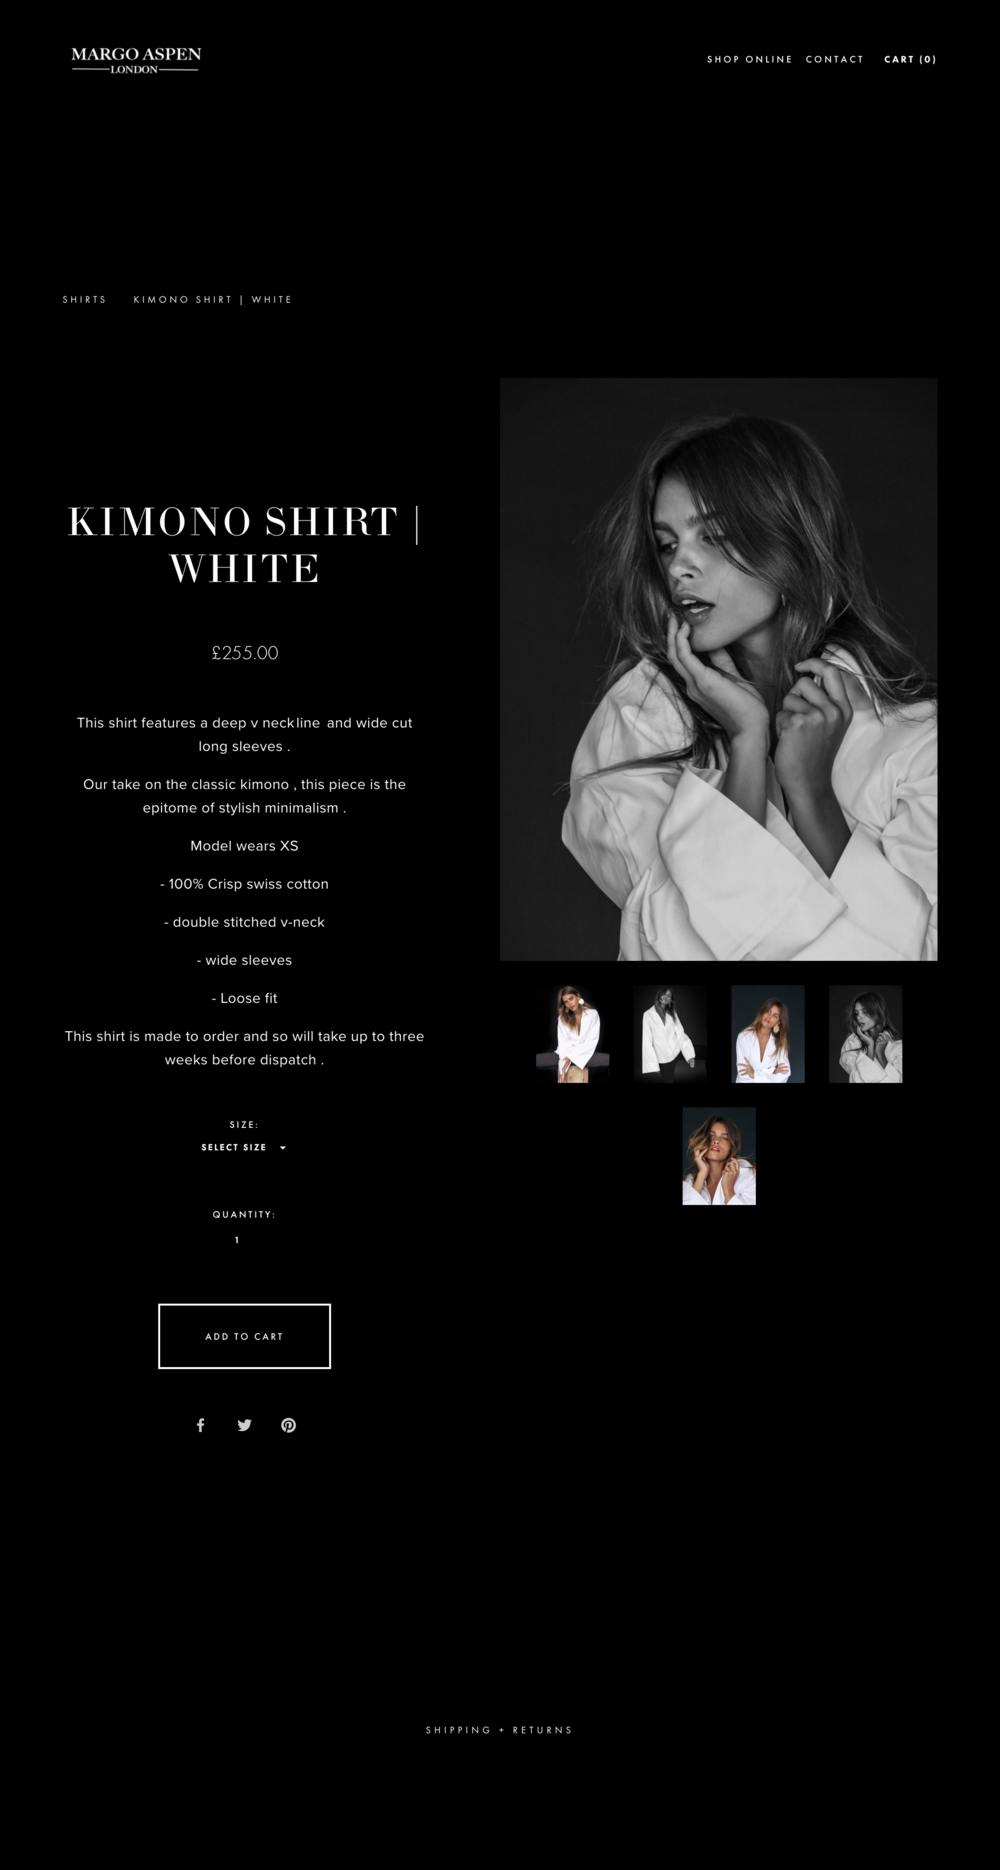 www.margoaspen.com-shirts-kimono-shirt-white(iPad Pro).png